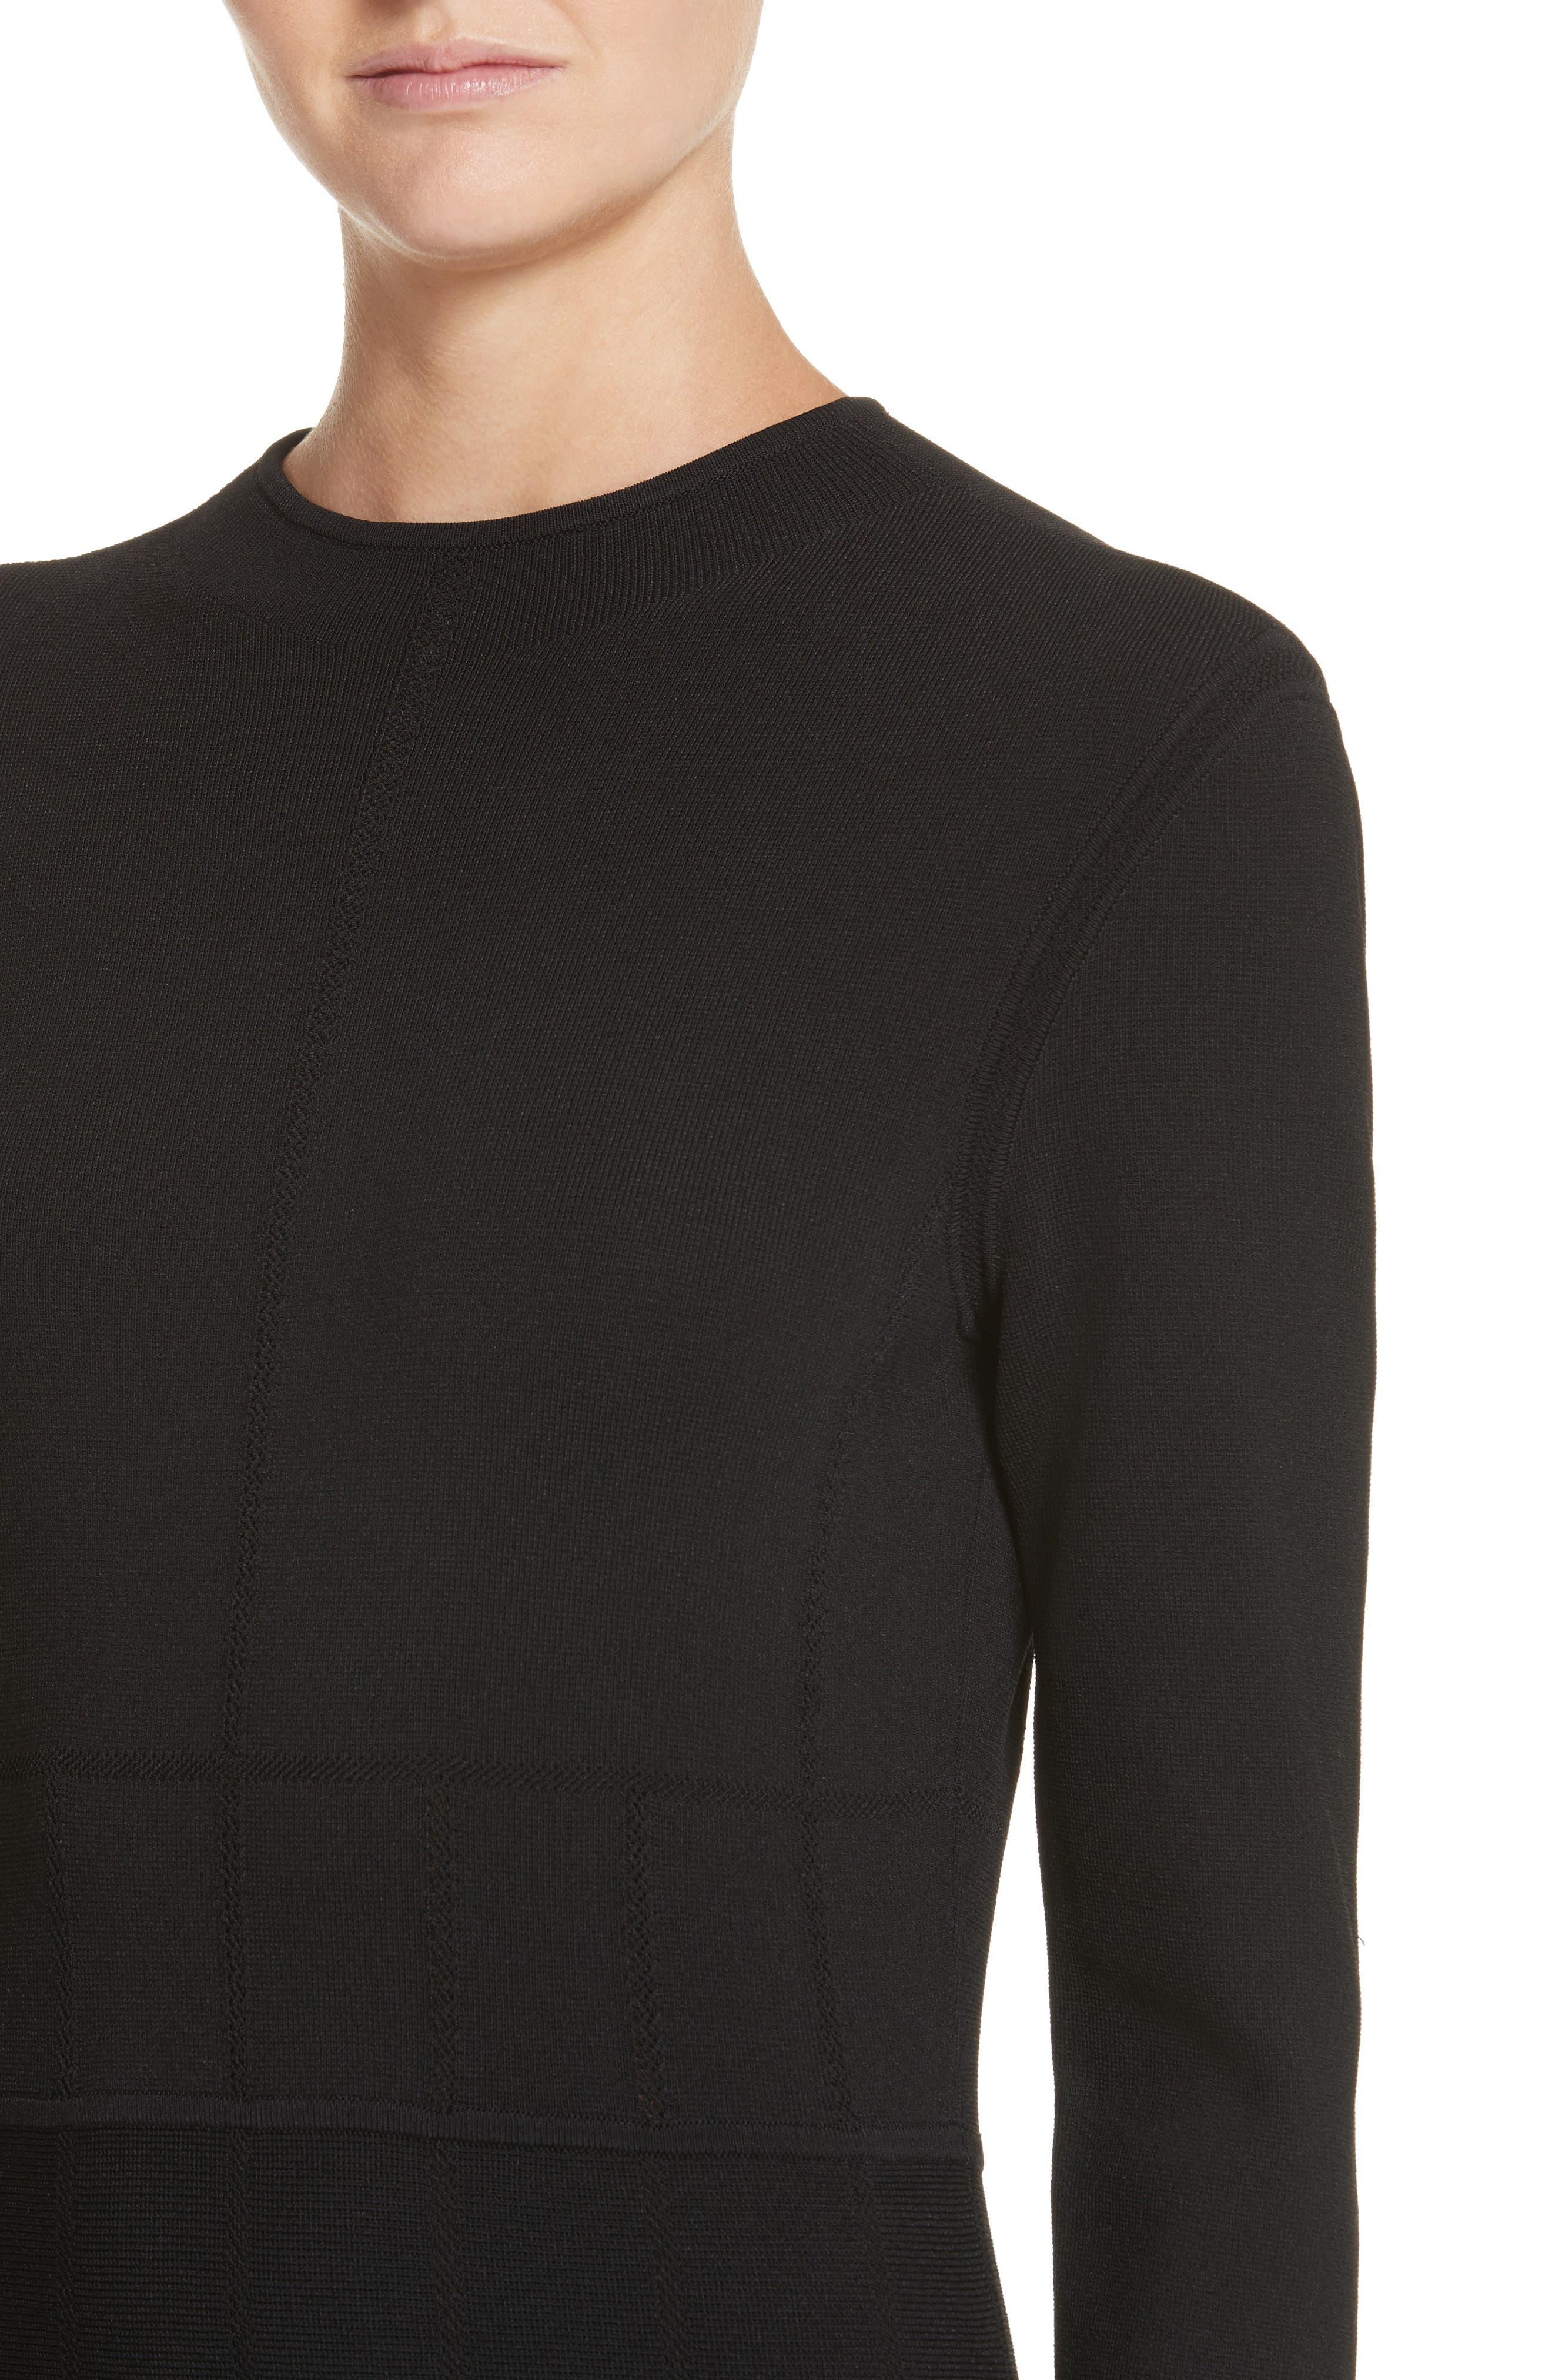 High Neck Fit & Flare Dress,                             Alternate thumbnail 4, color,                             Black